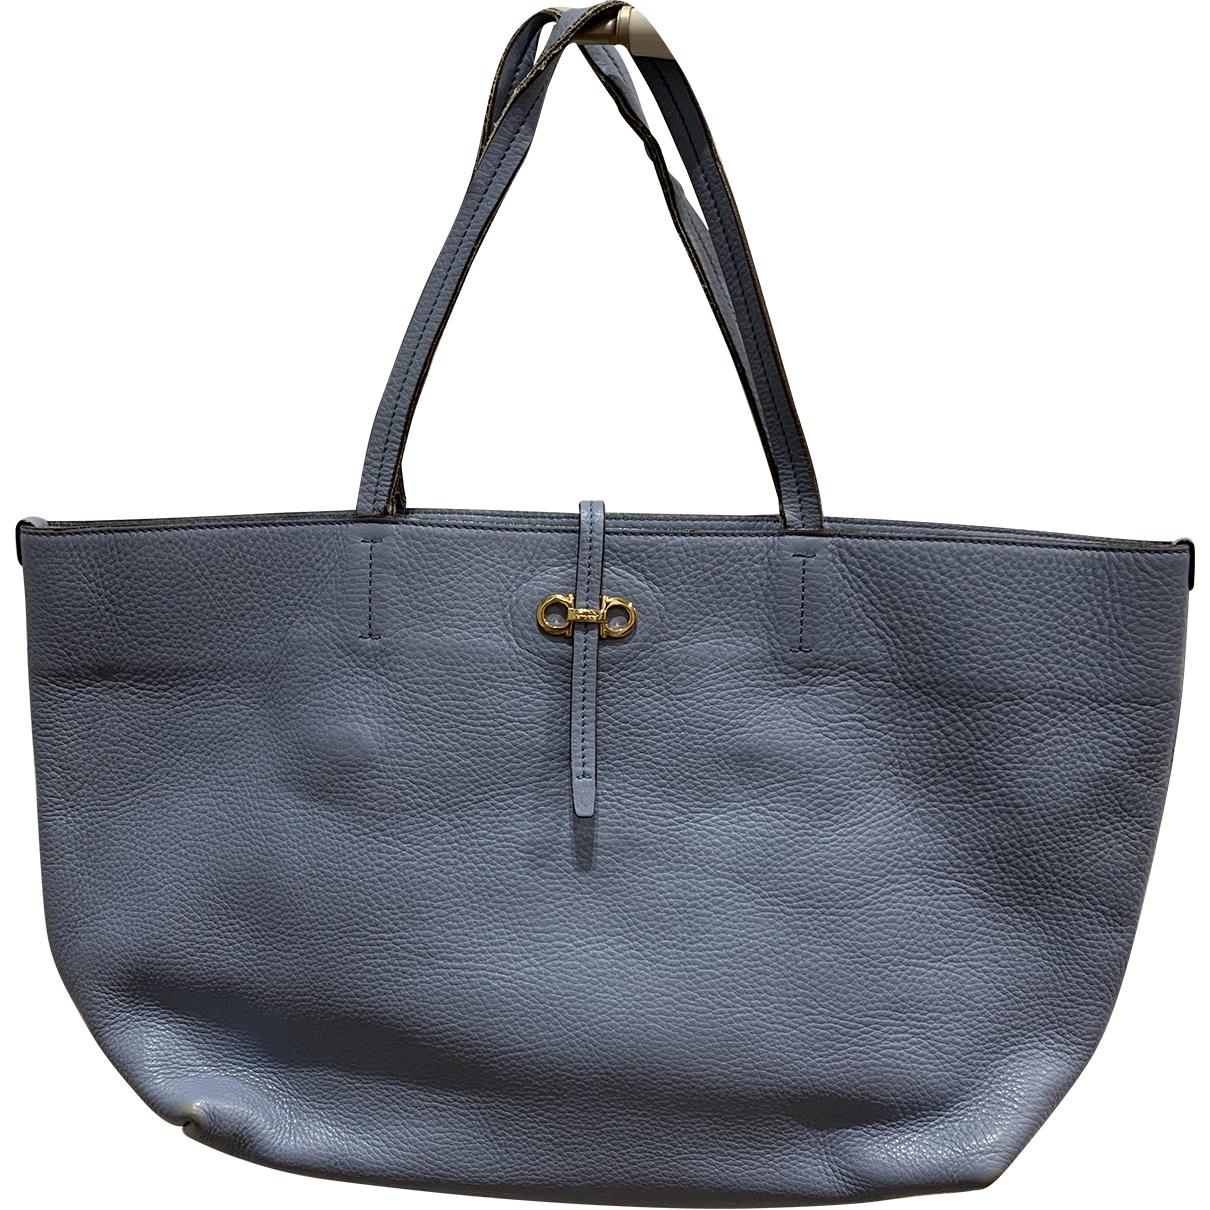 Salvatore Ferragamo N Blue Leather handbag for Women N